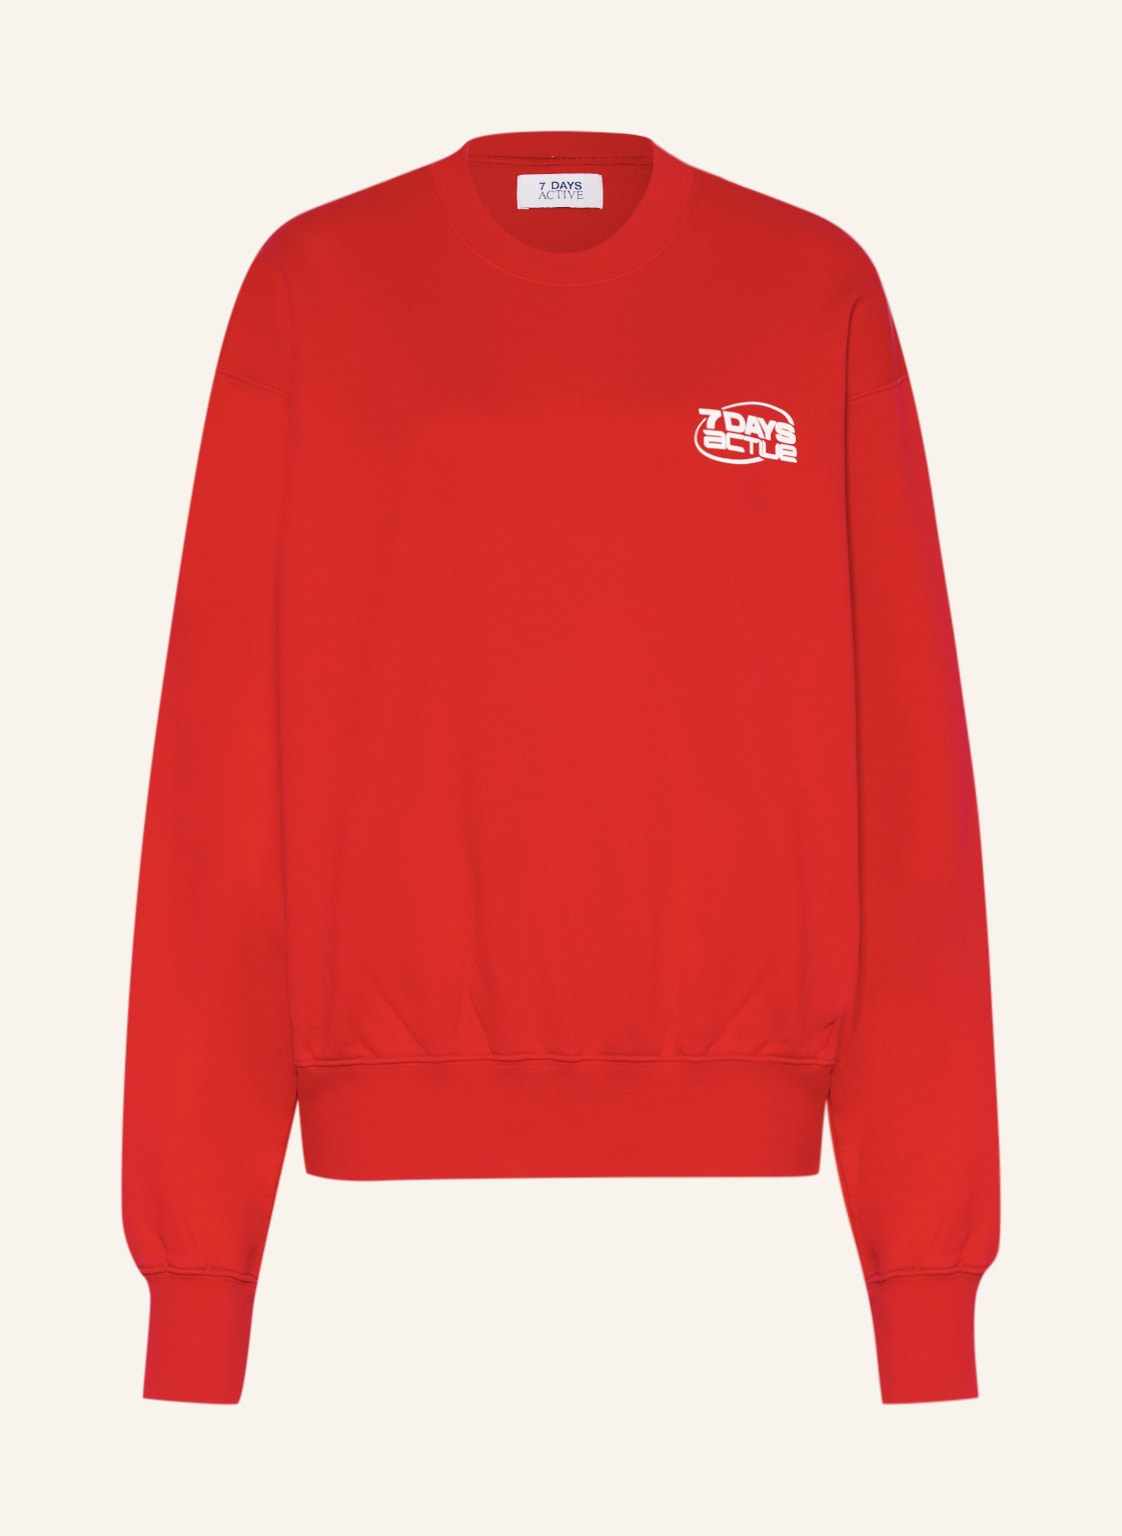 Image of 7 Days Active Sweatshirt rot